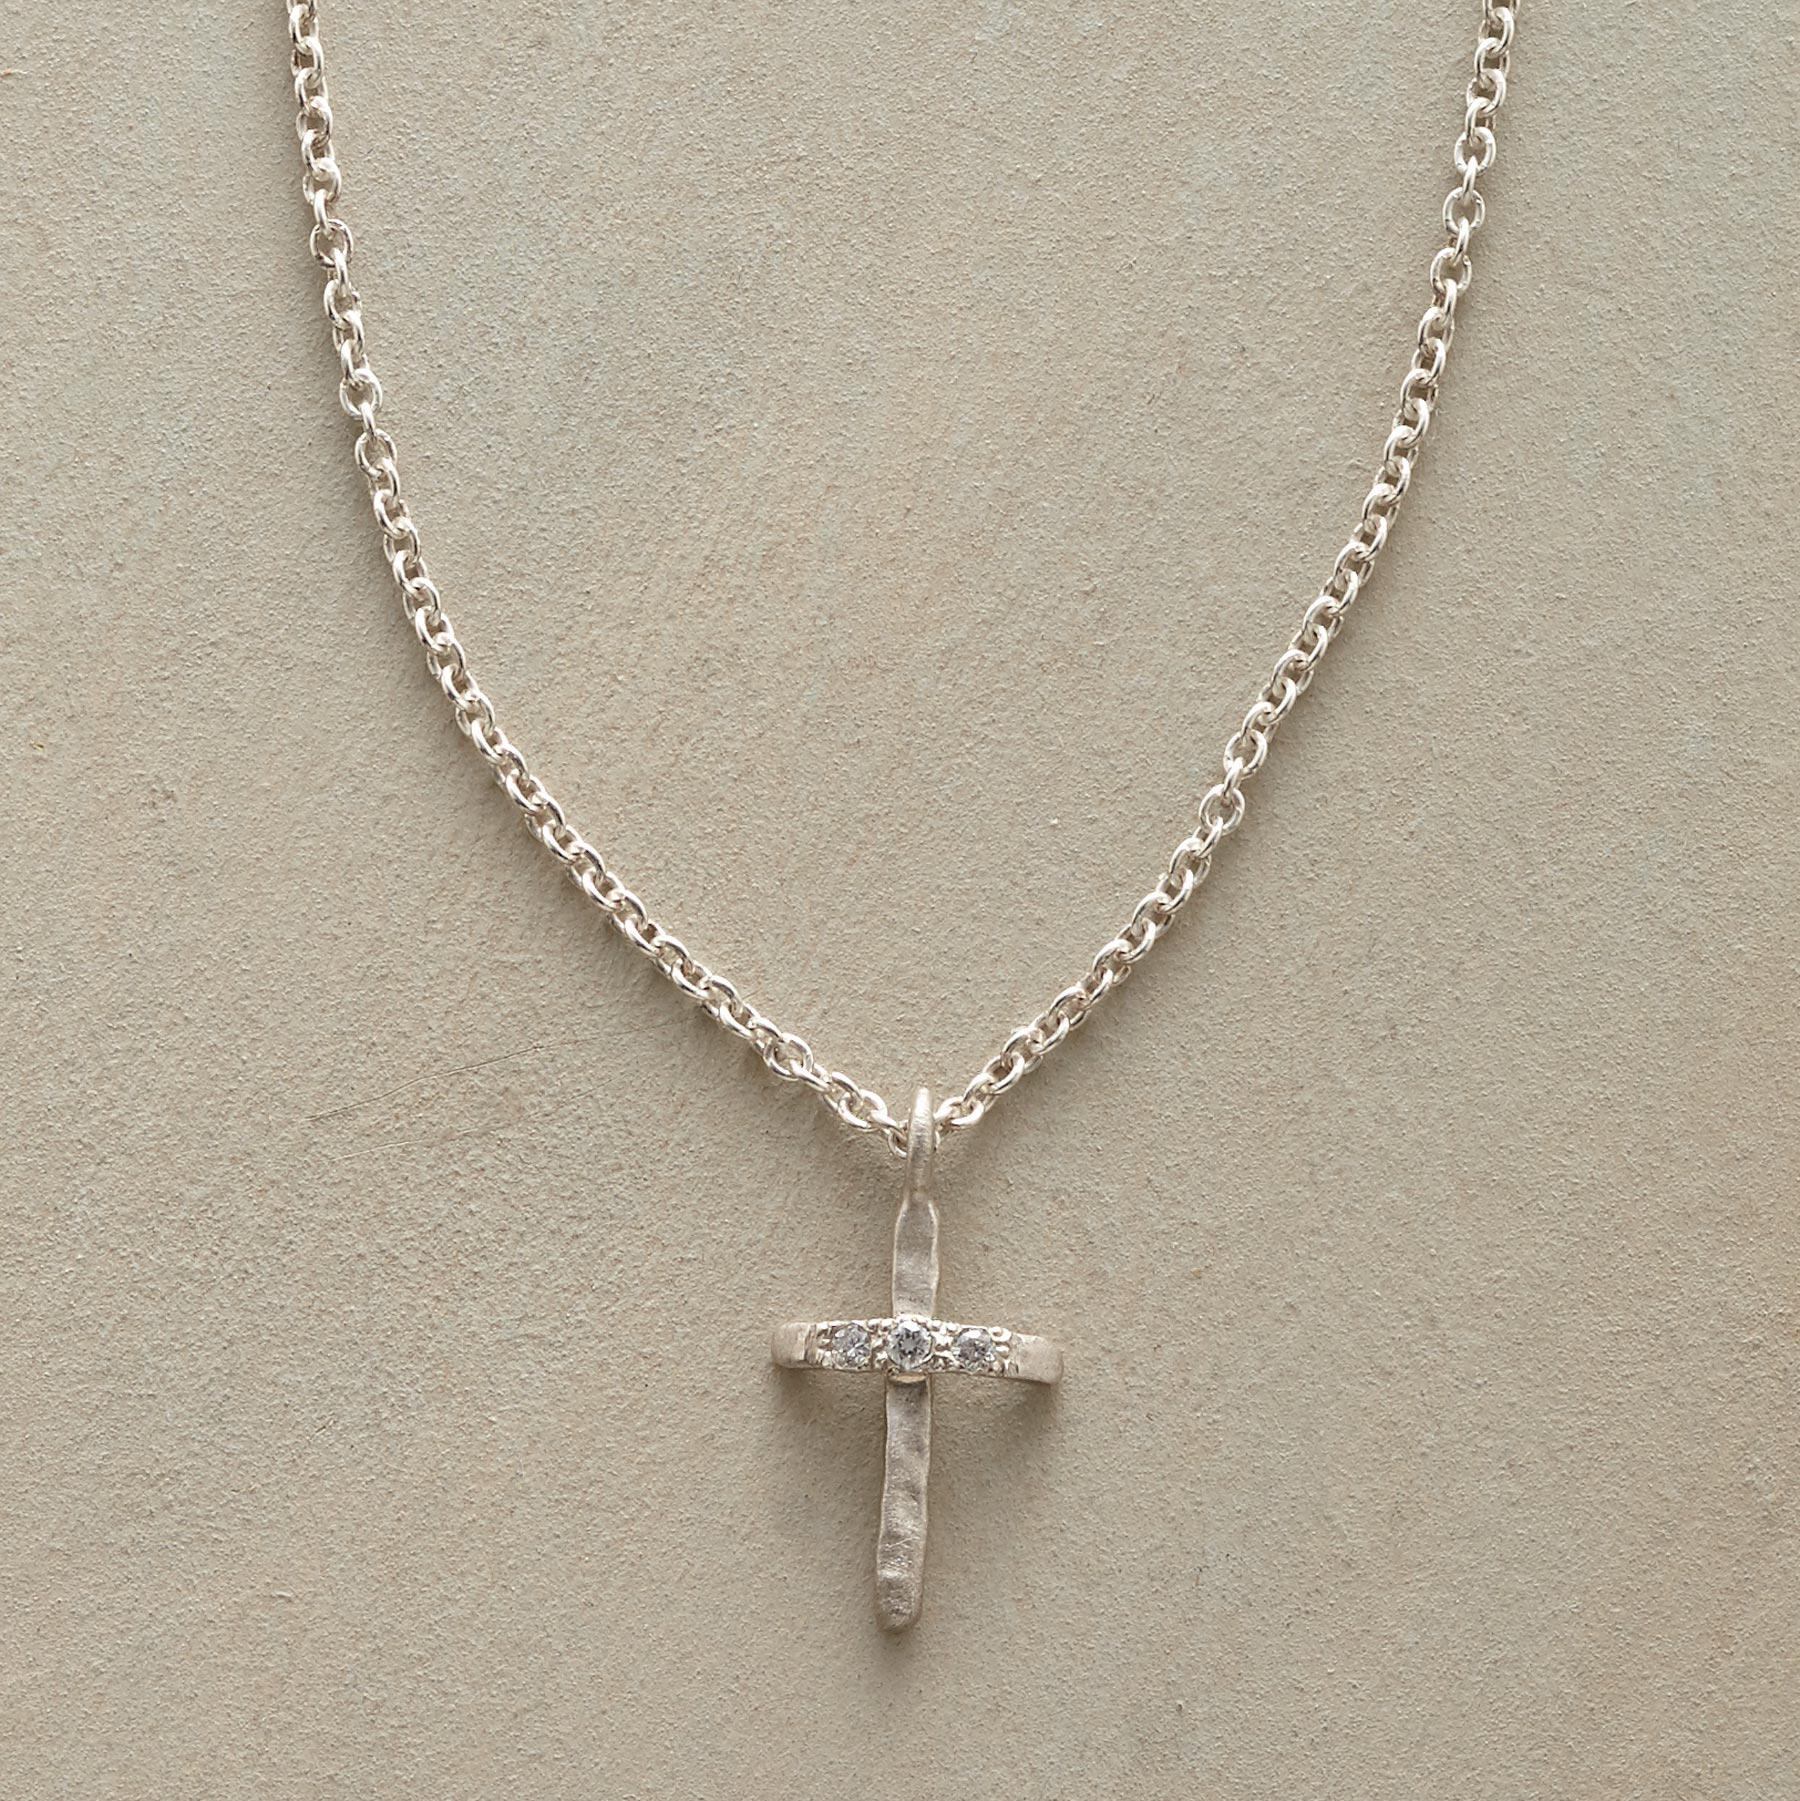 Rebecca Lankford Diamond-kissed Cross Necklace